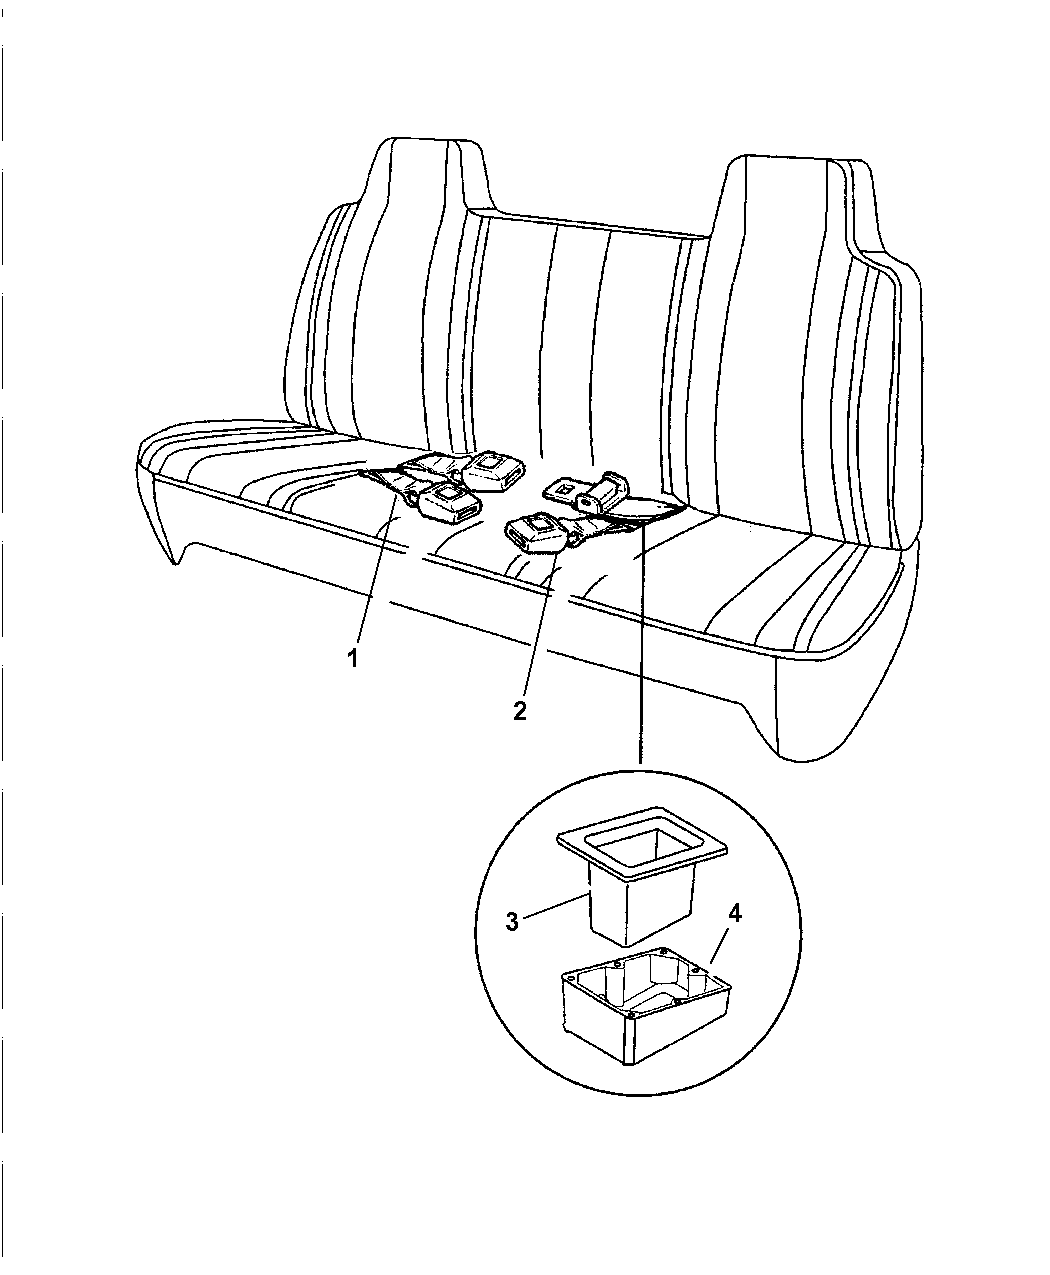 Outstanding 1999 Dodge Ram 1500 Regular Cab Belts Lap Bench Seat Dailytribune Chair Design For Home Dailytribuneorg